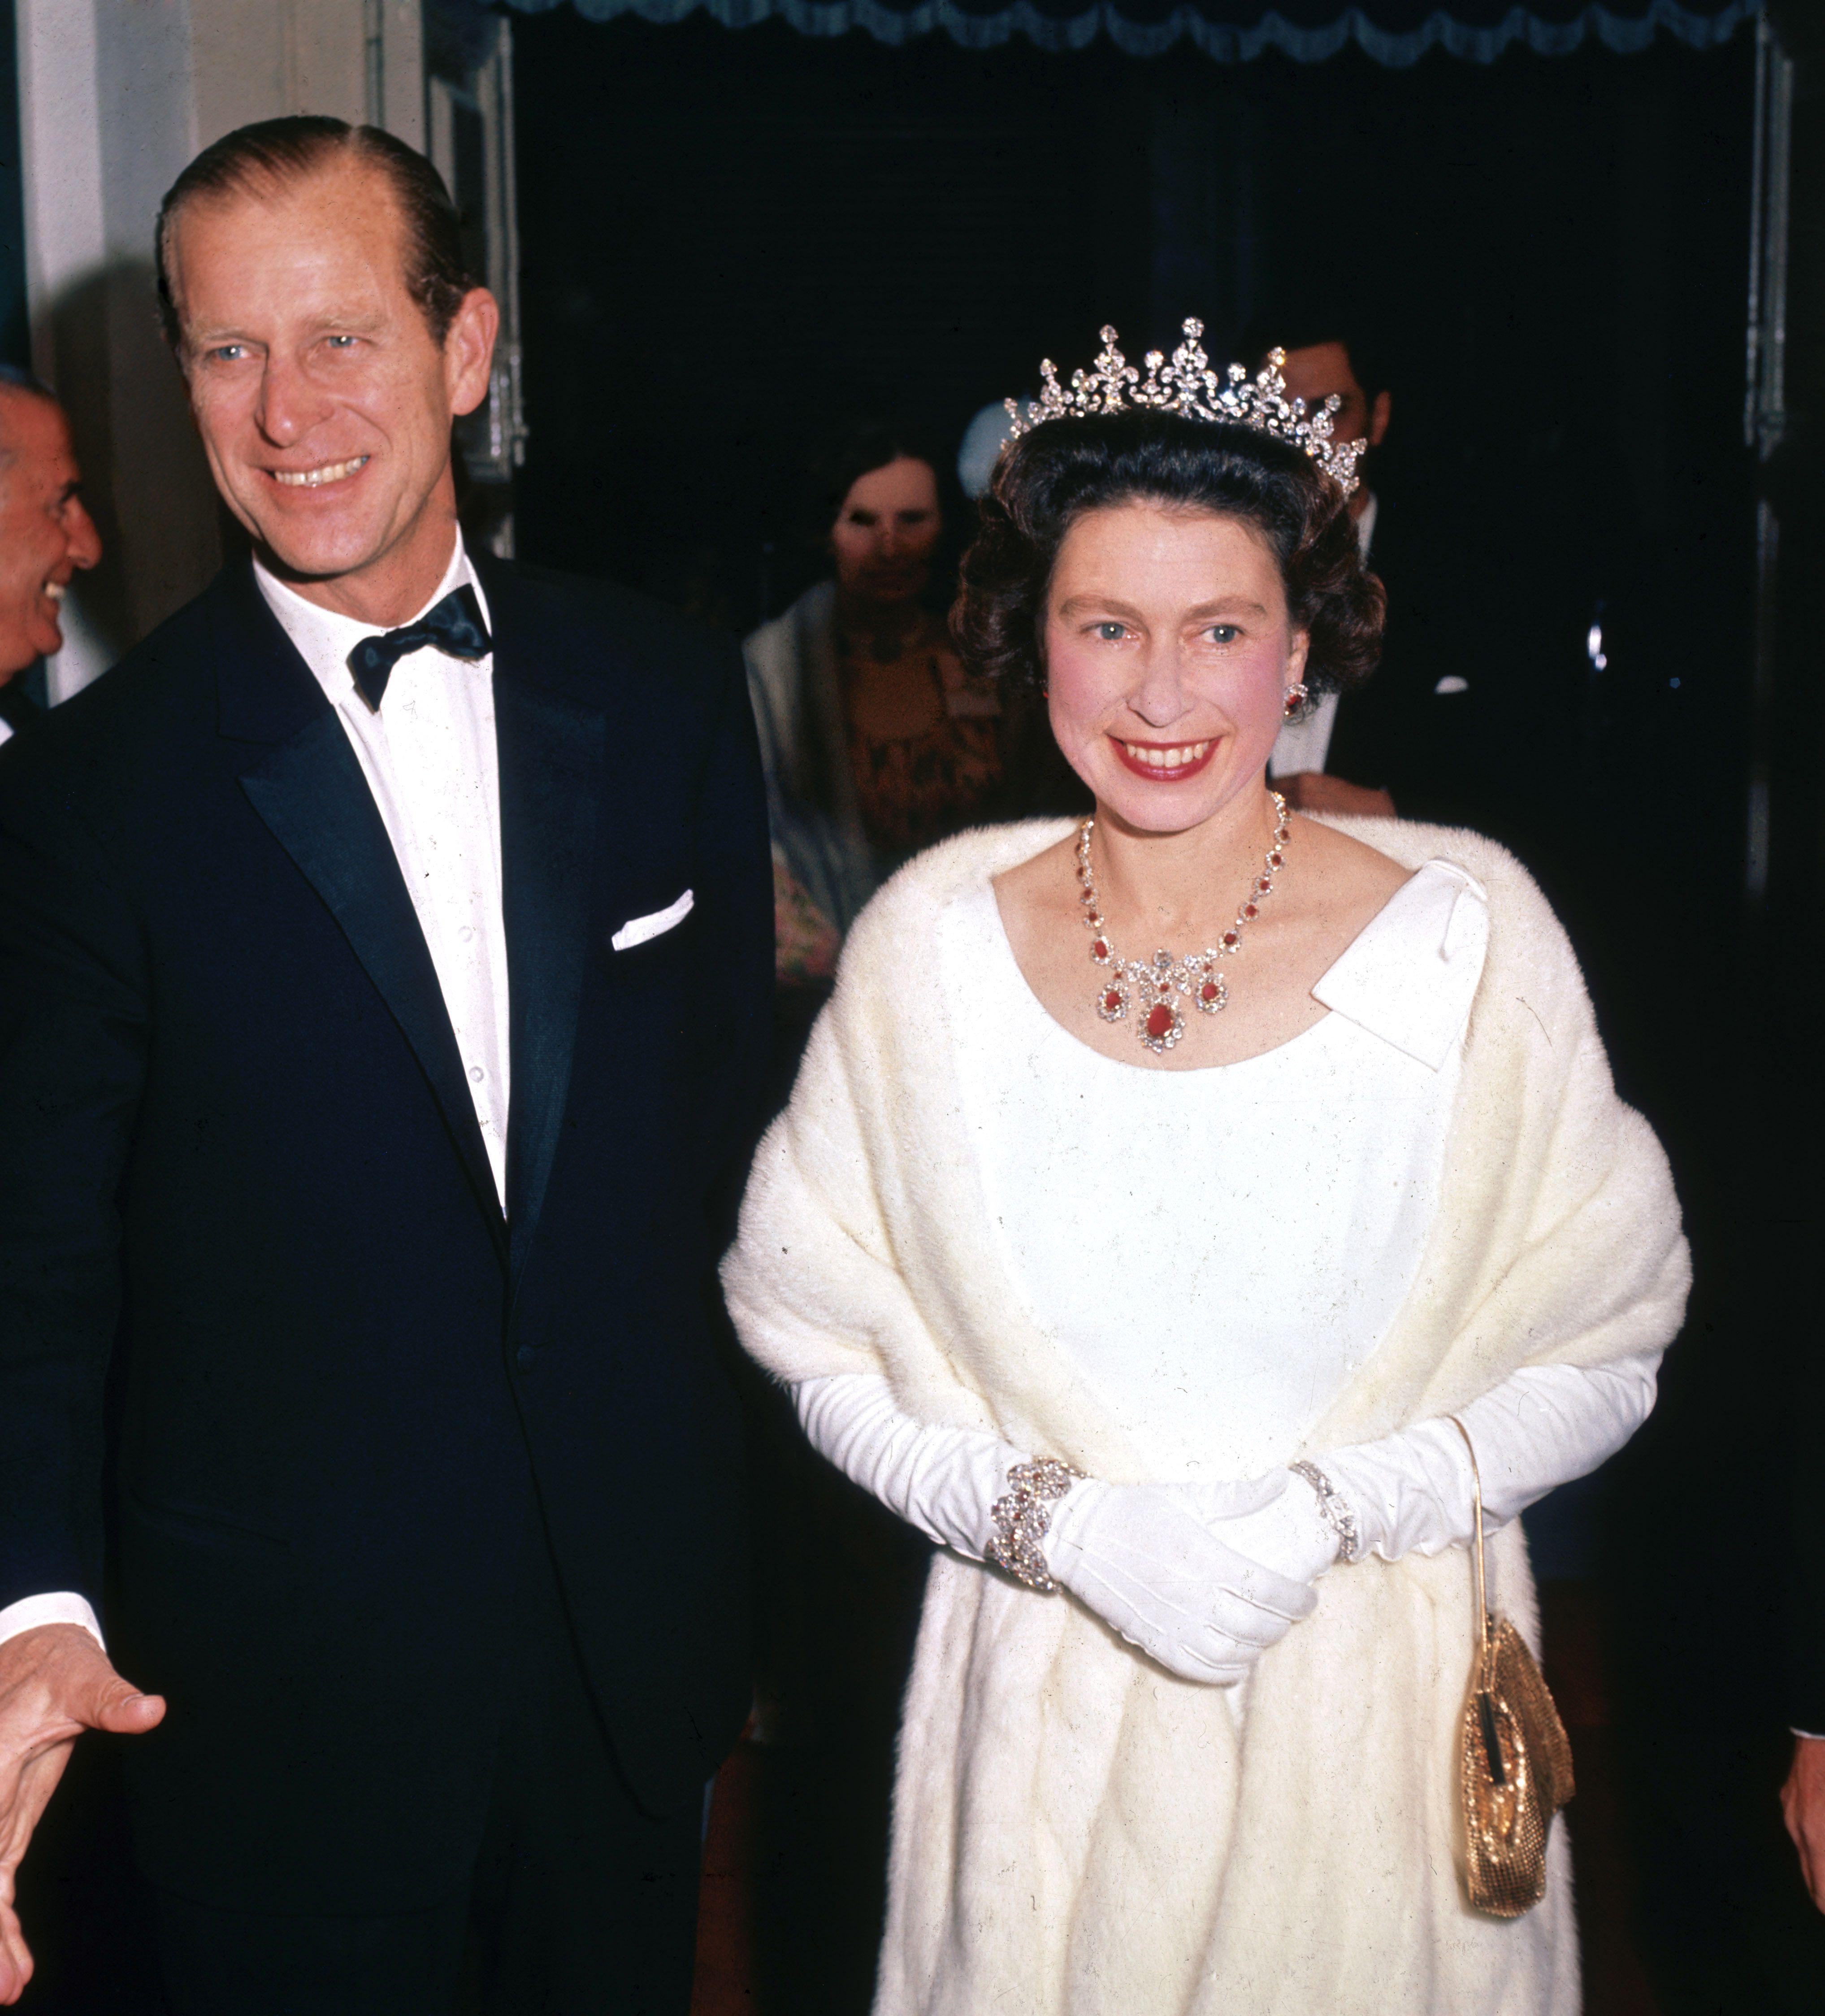 1967: Queen Elizabeth II and Prince Philip in Malta